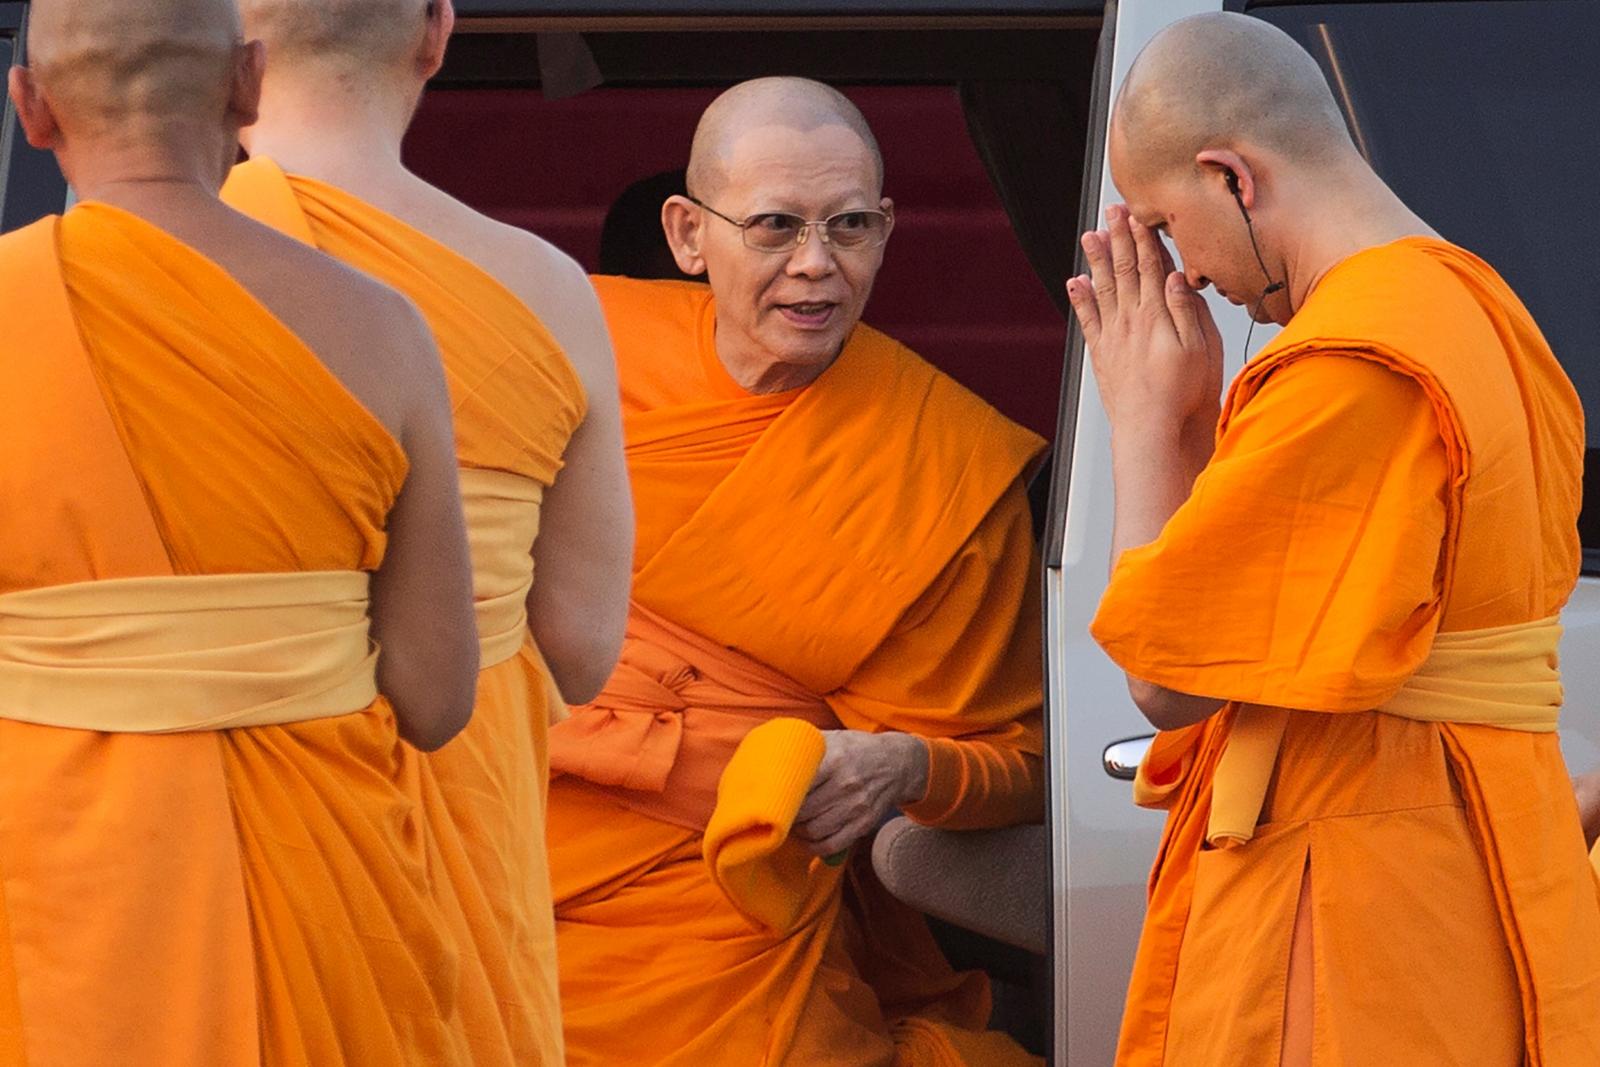 Phra Dhammachayo